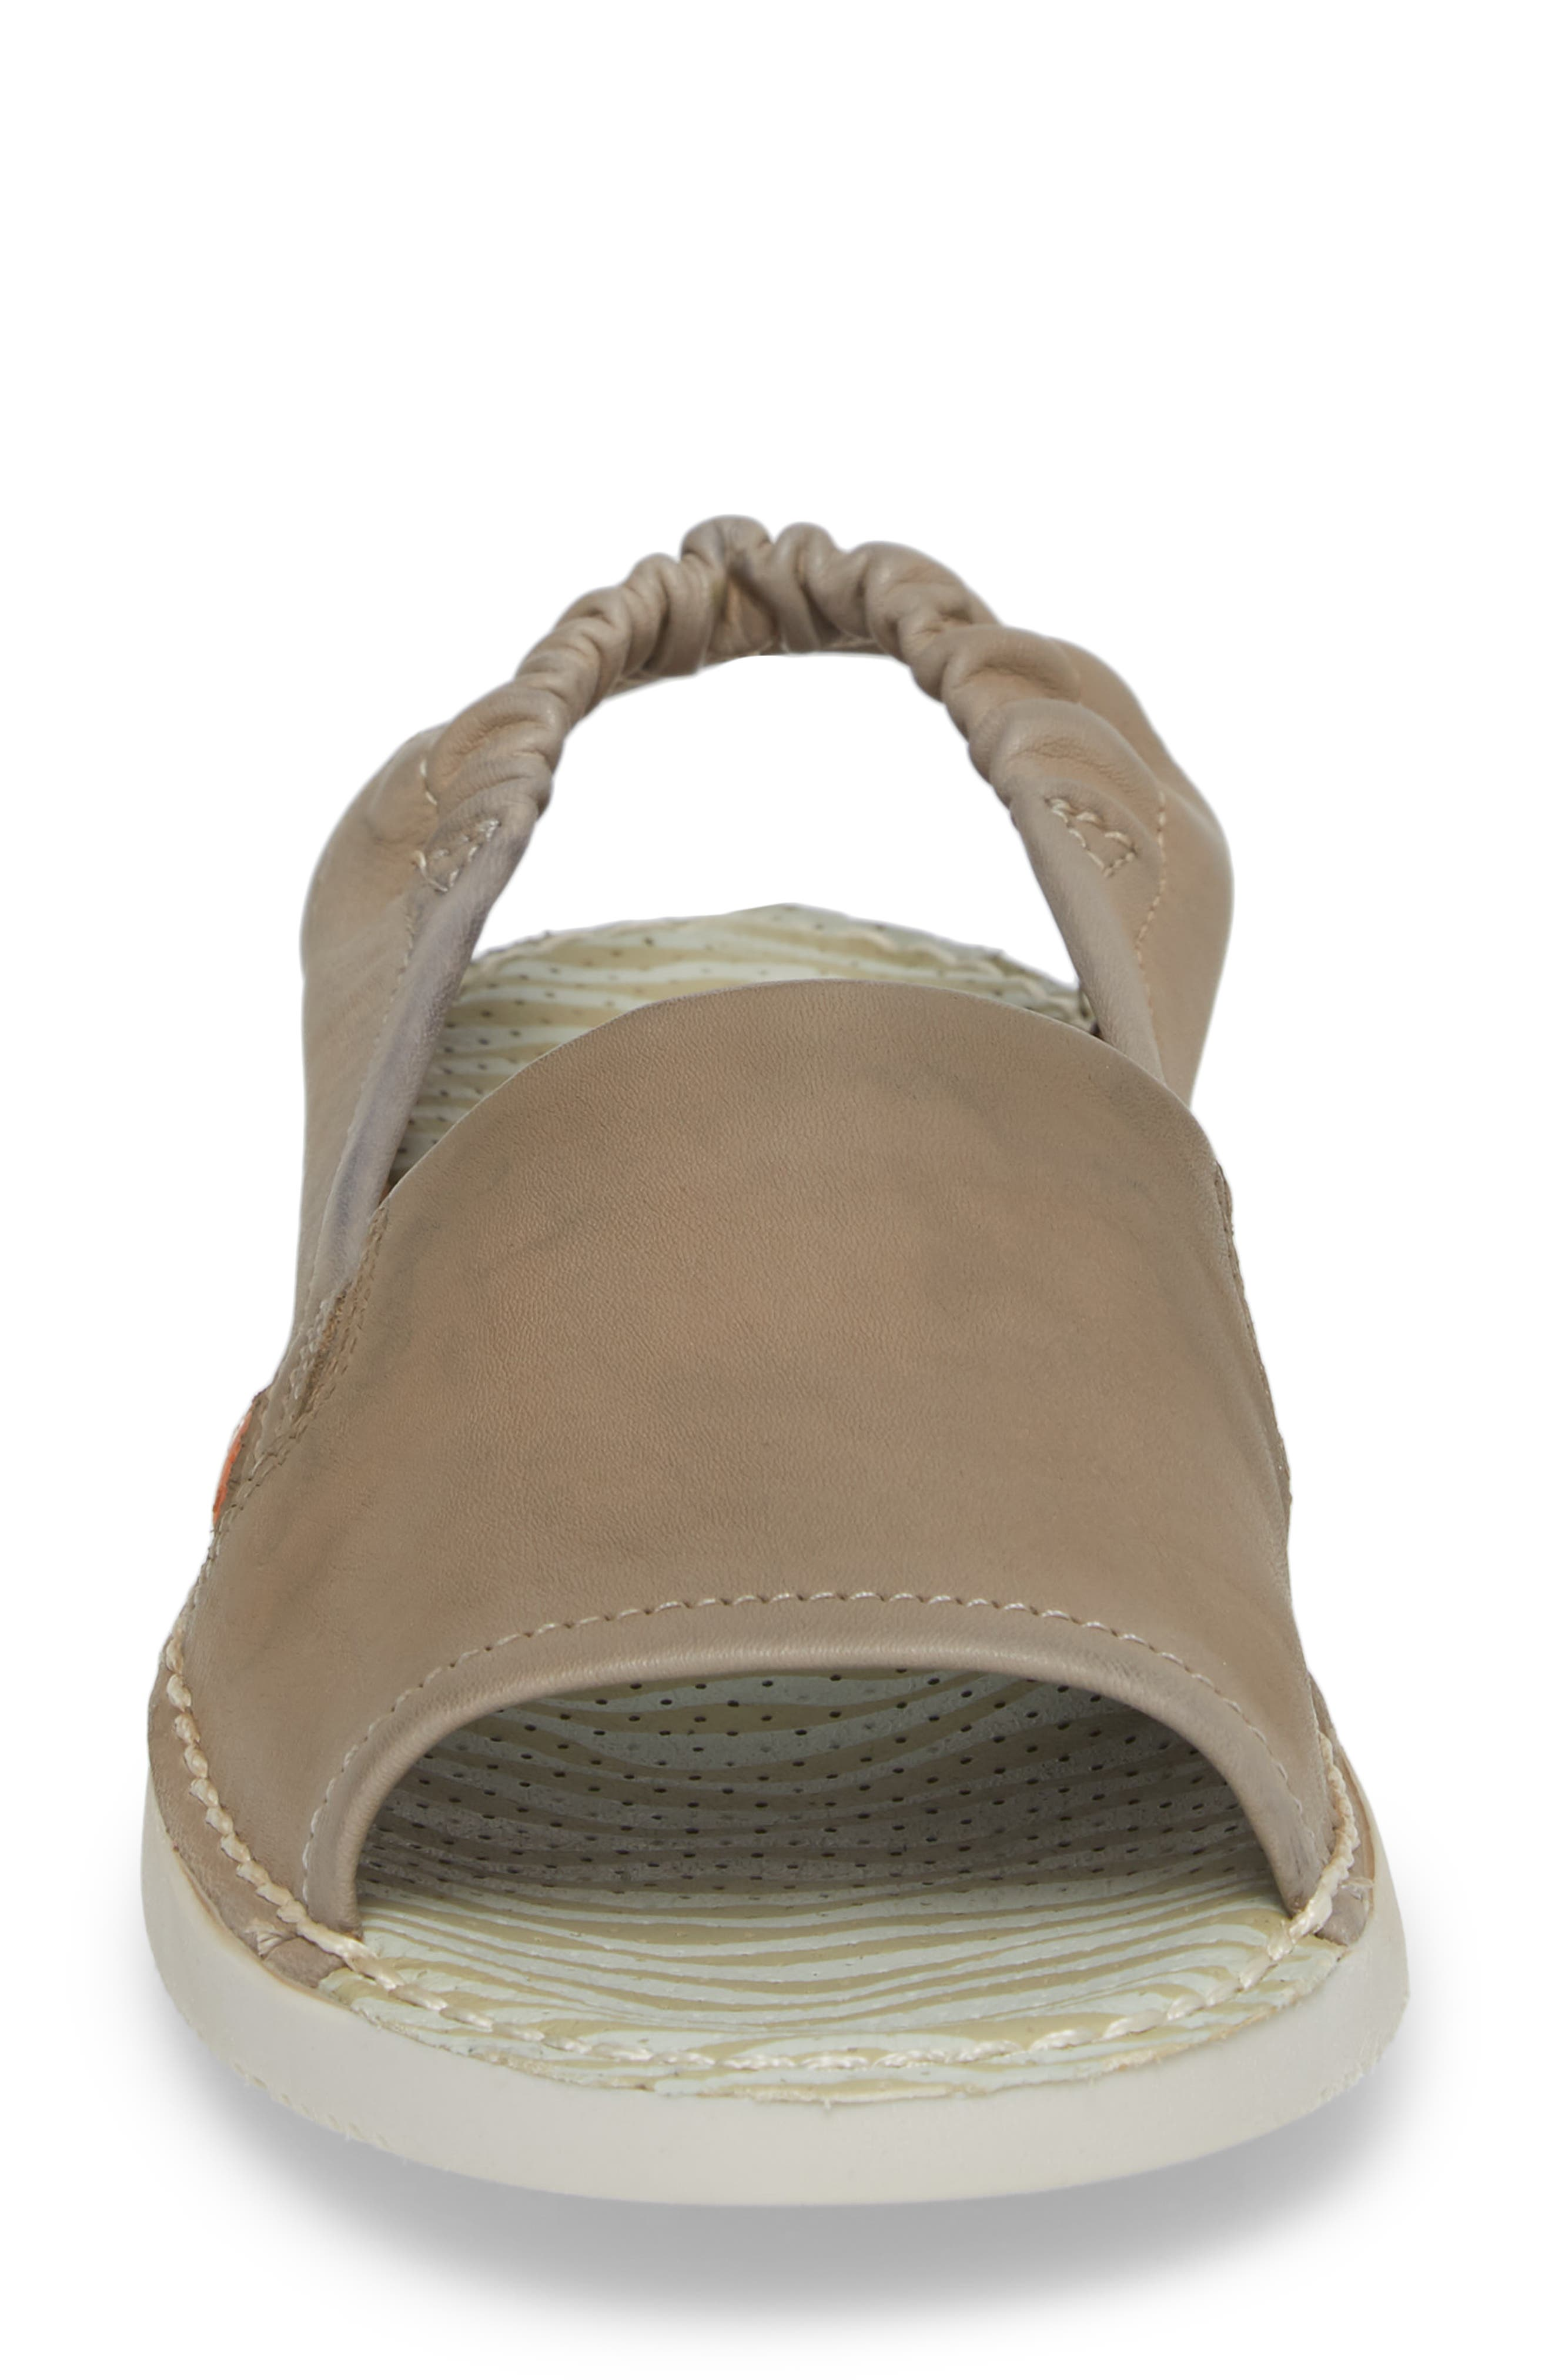 Tee Flat Sandal,                             Alternate thumbnail 4, color,                             Taupe Leather